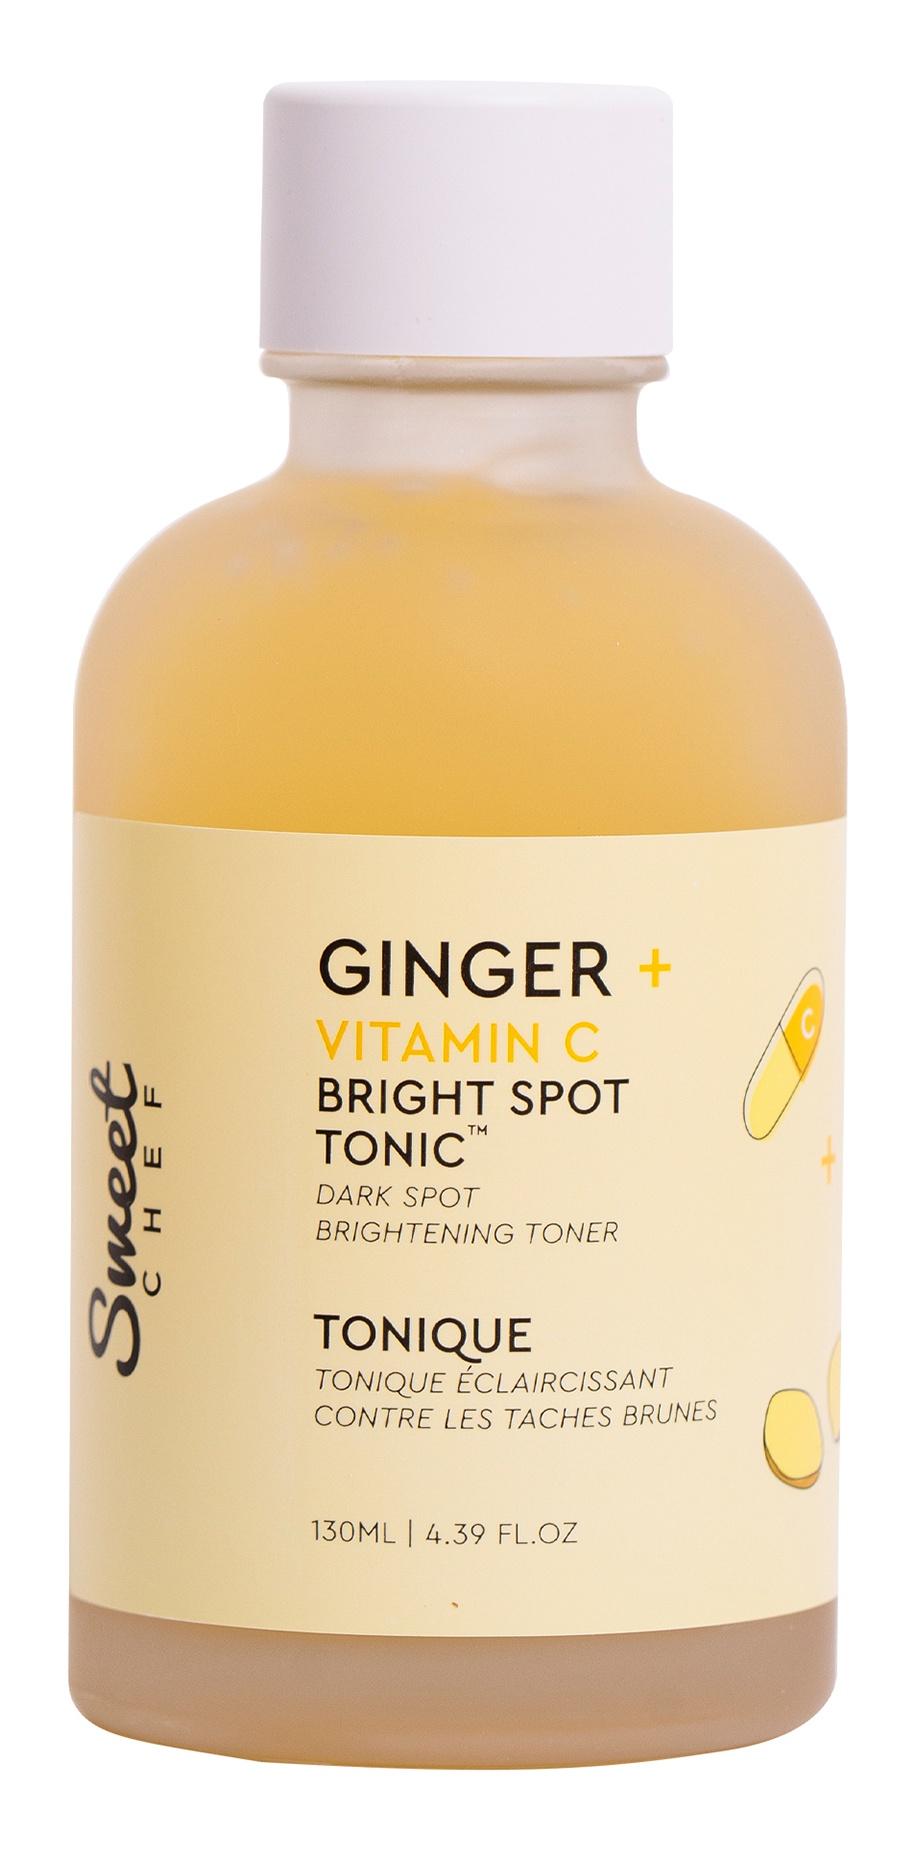 Sweet Chef Ginger + Vitamin C Bright Spot Tonic